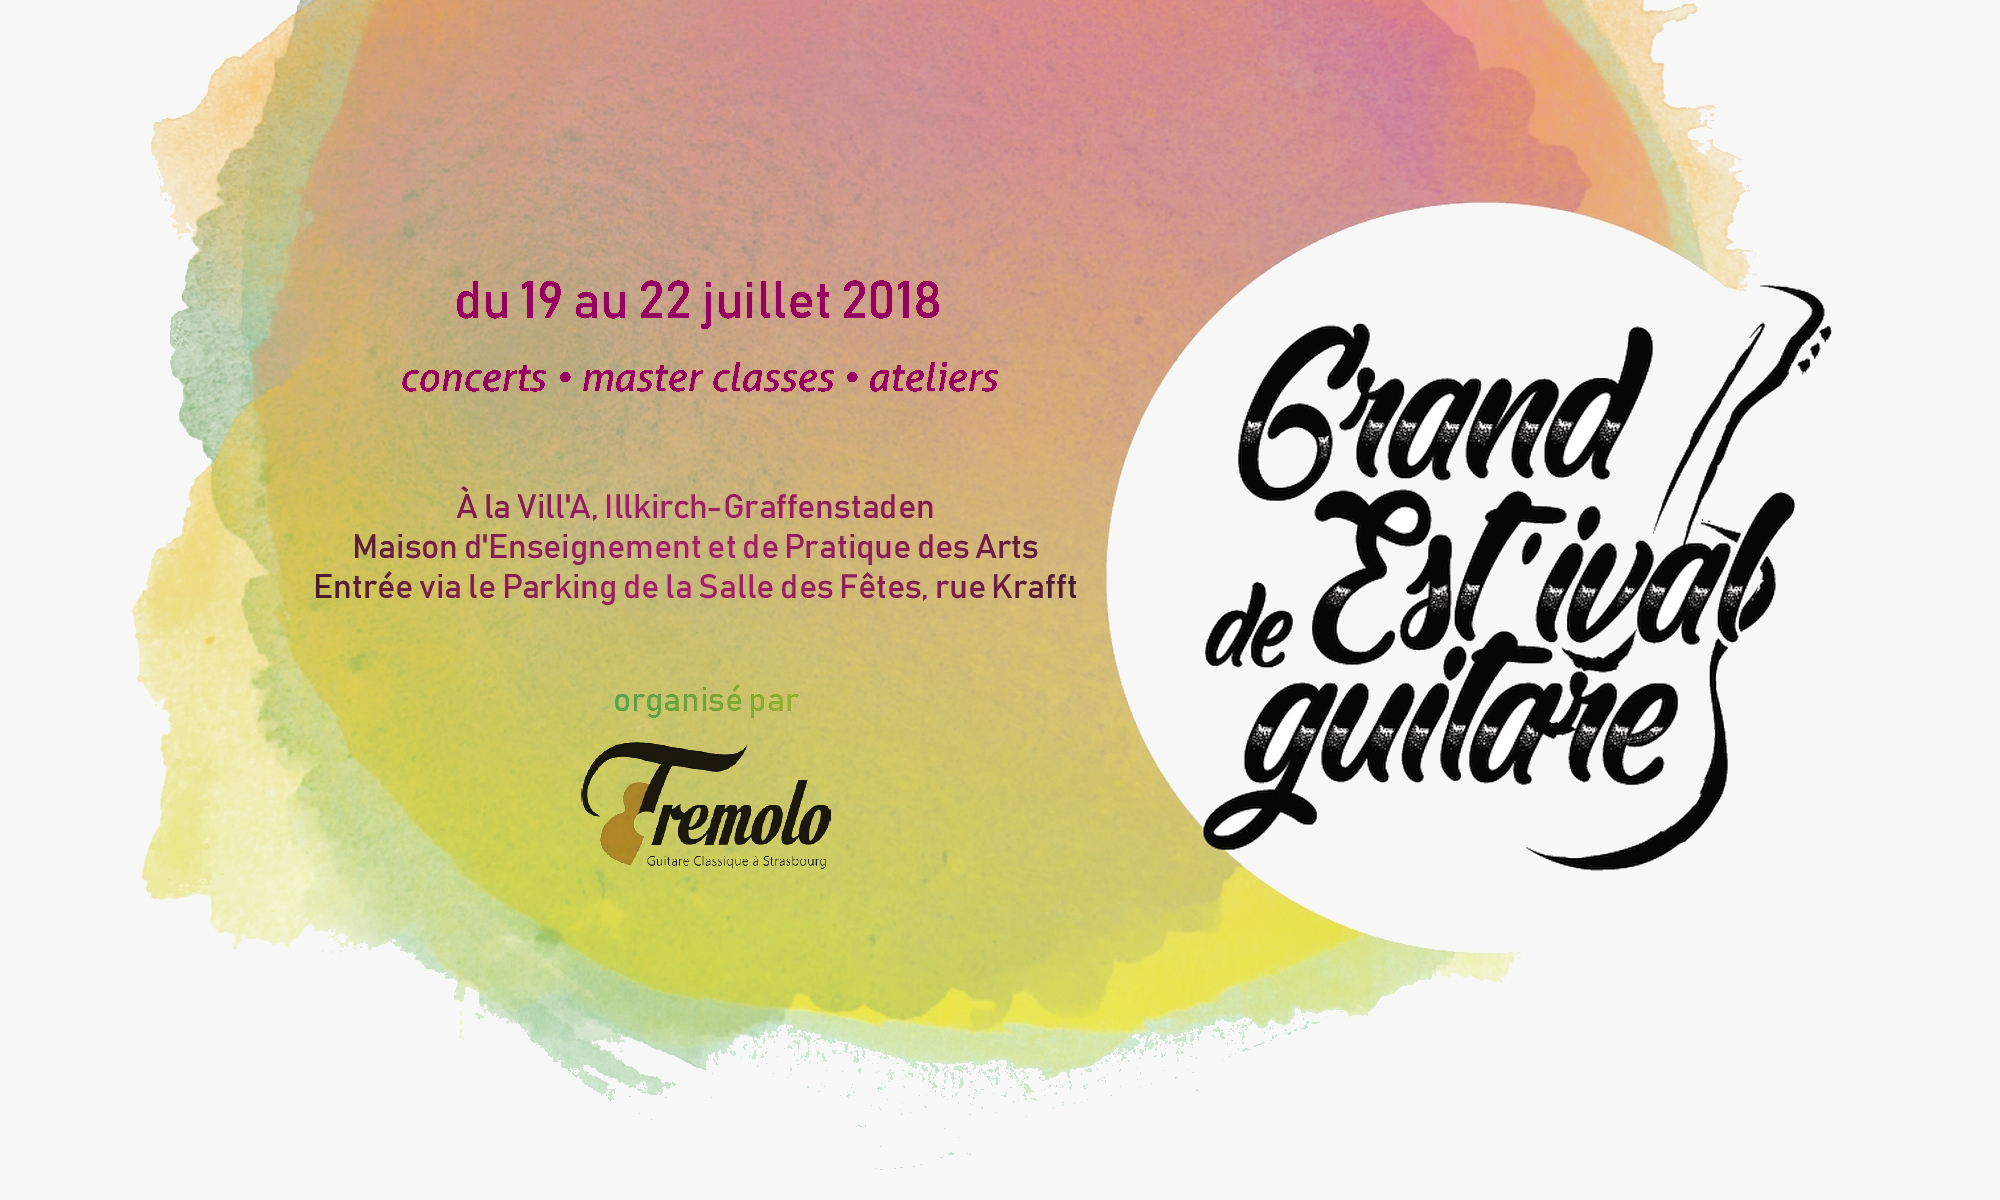 Grand Estival de Guitare 2018